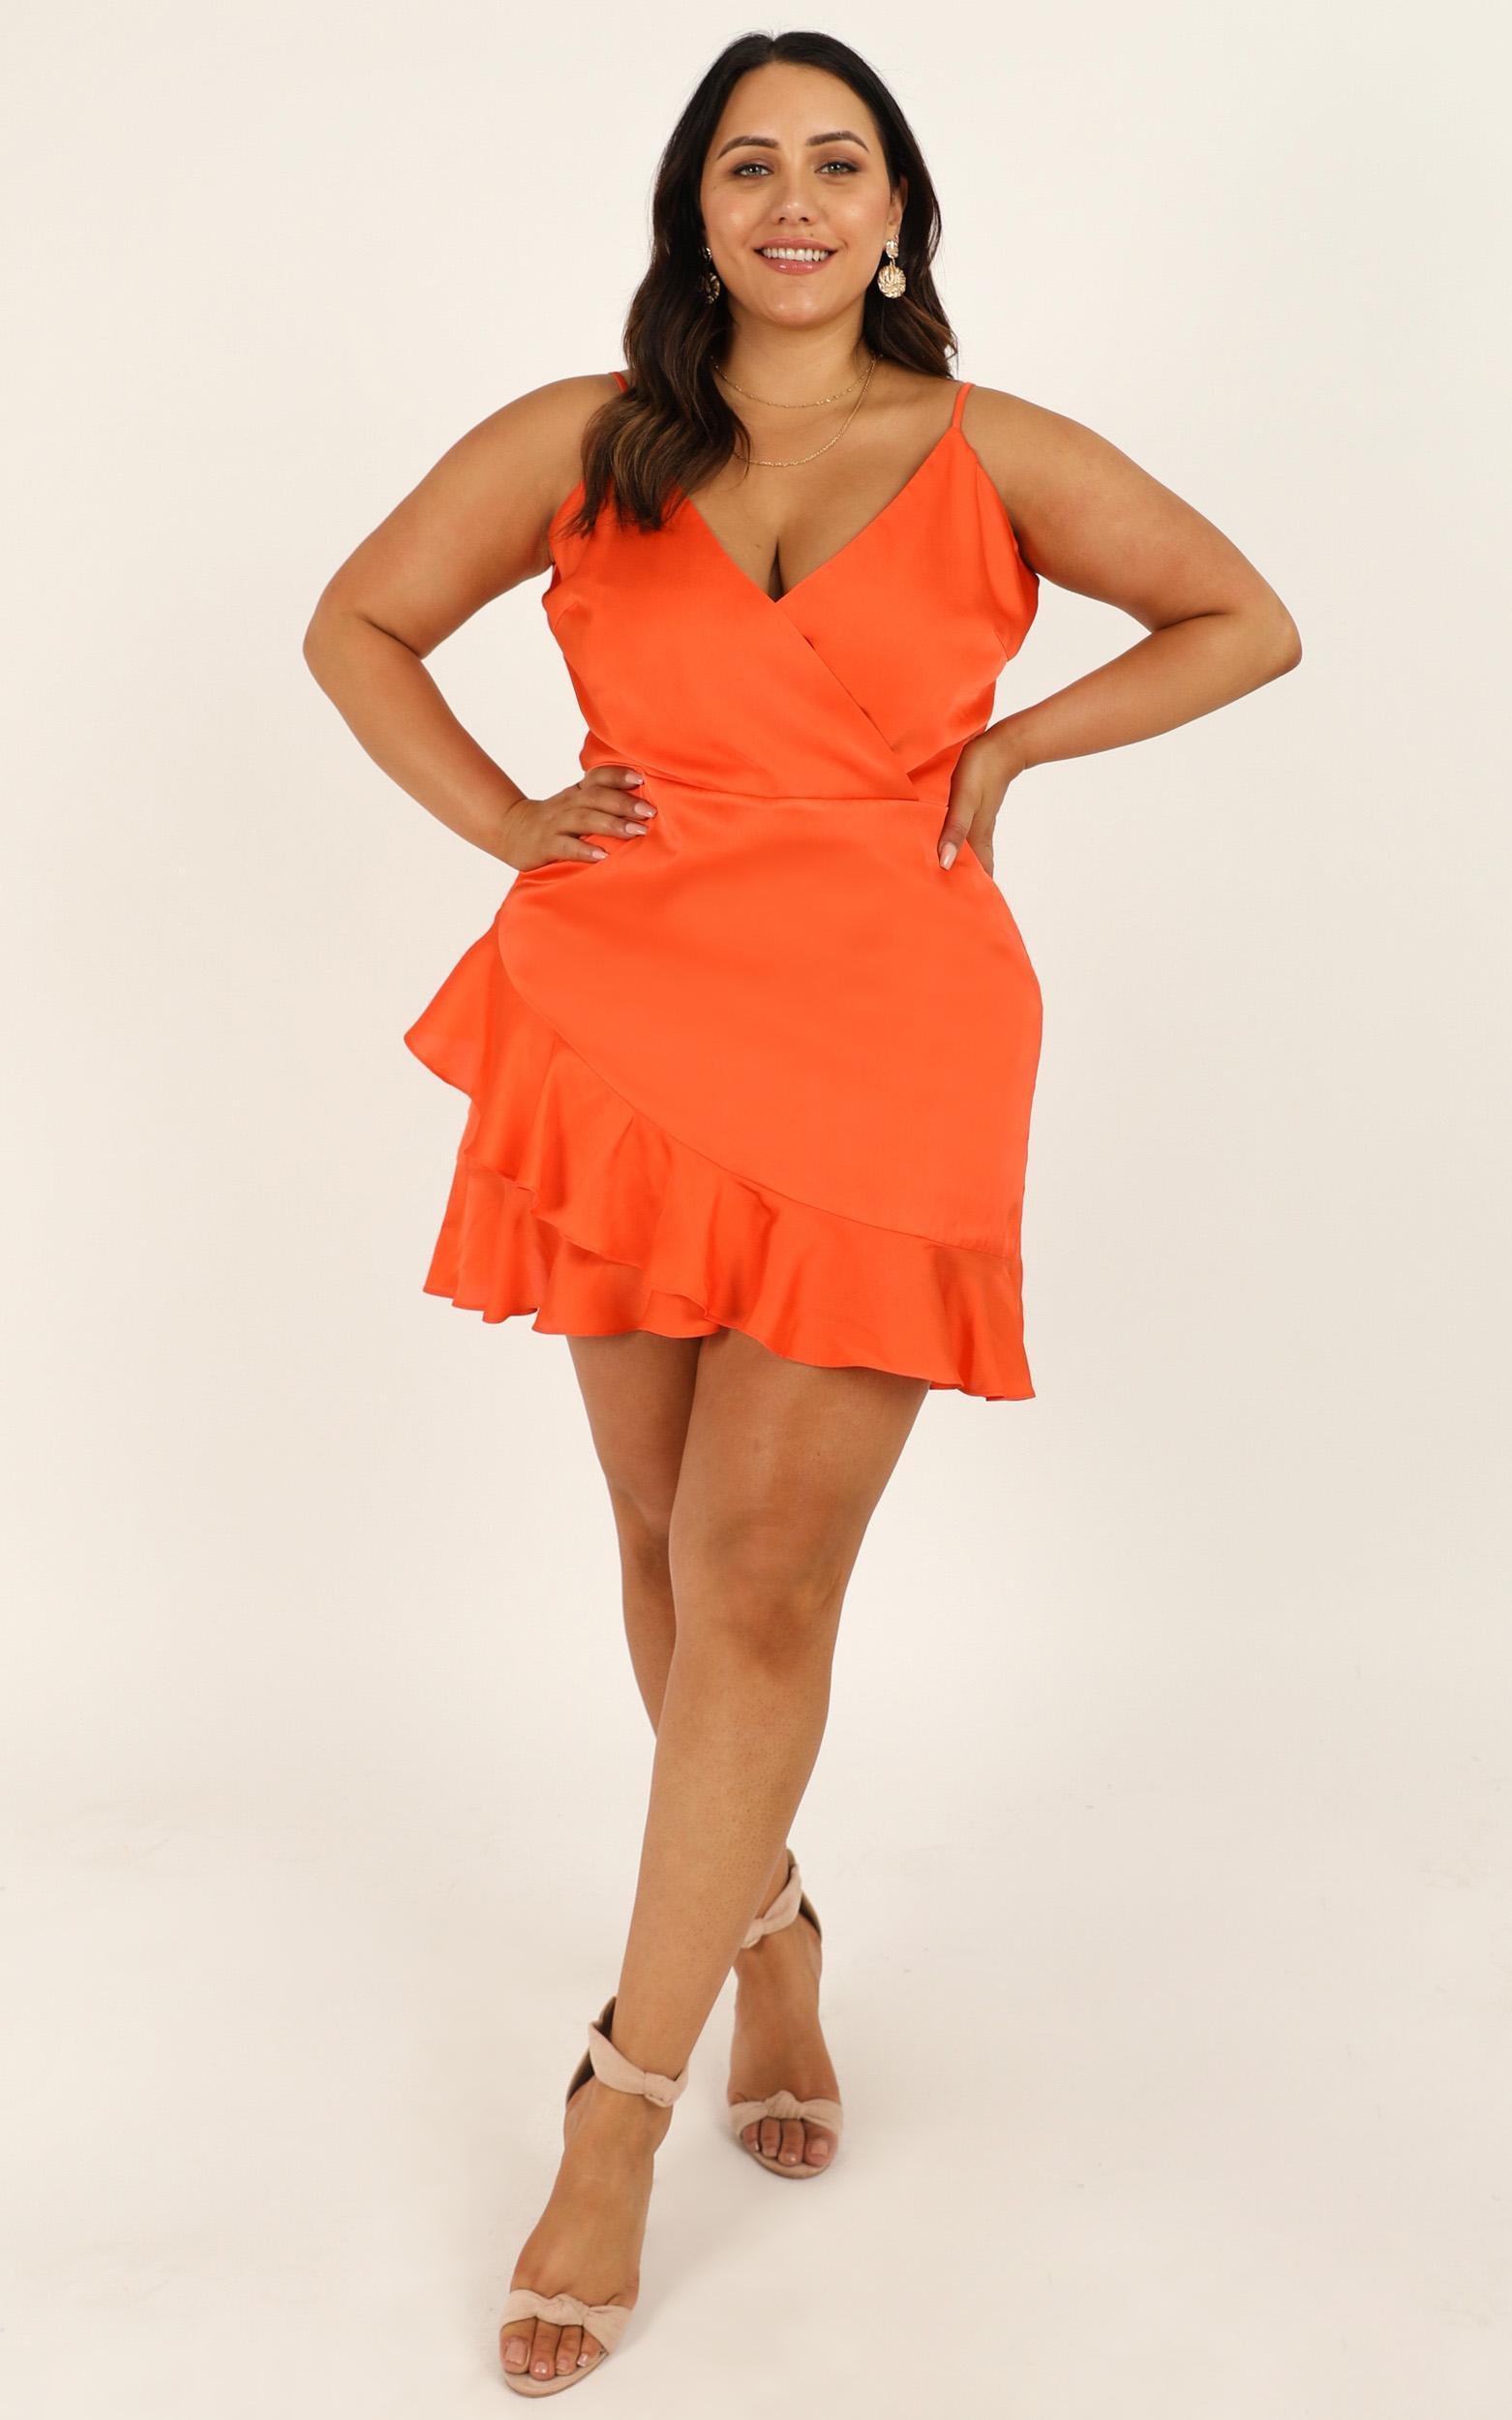 Cloud Cover Dress In tangerine satin - 16 (XXL), Orange, hi-res image number null